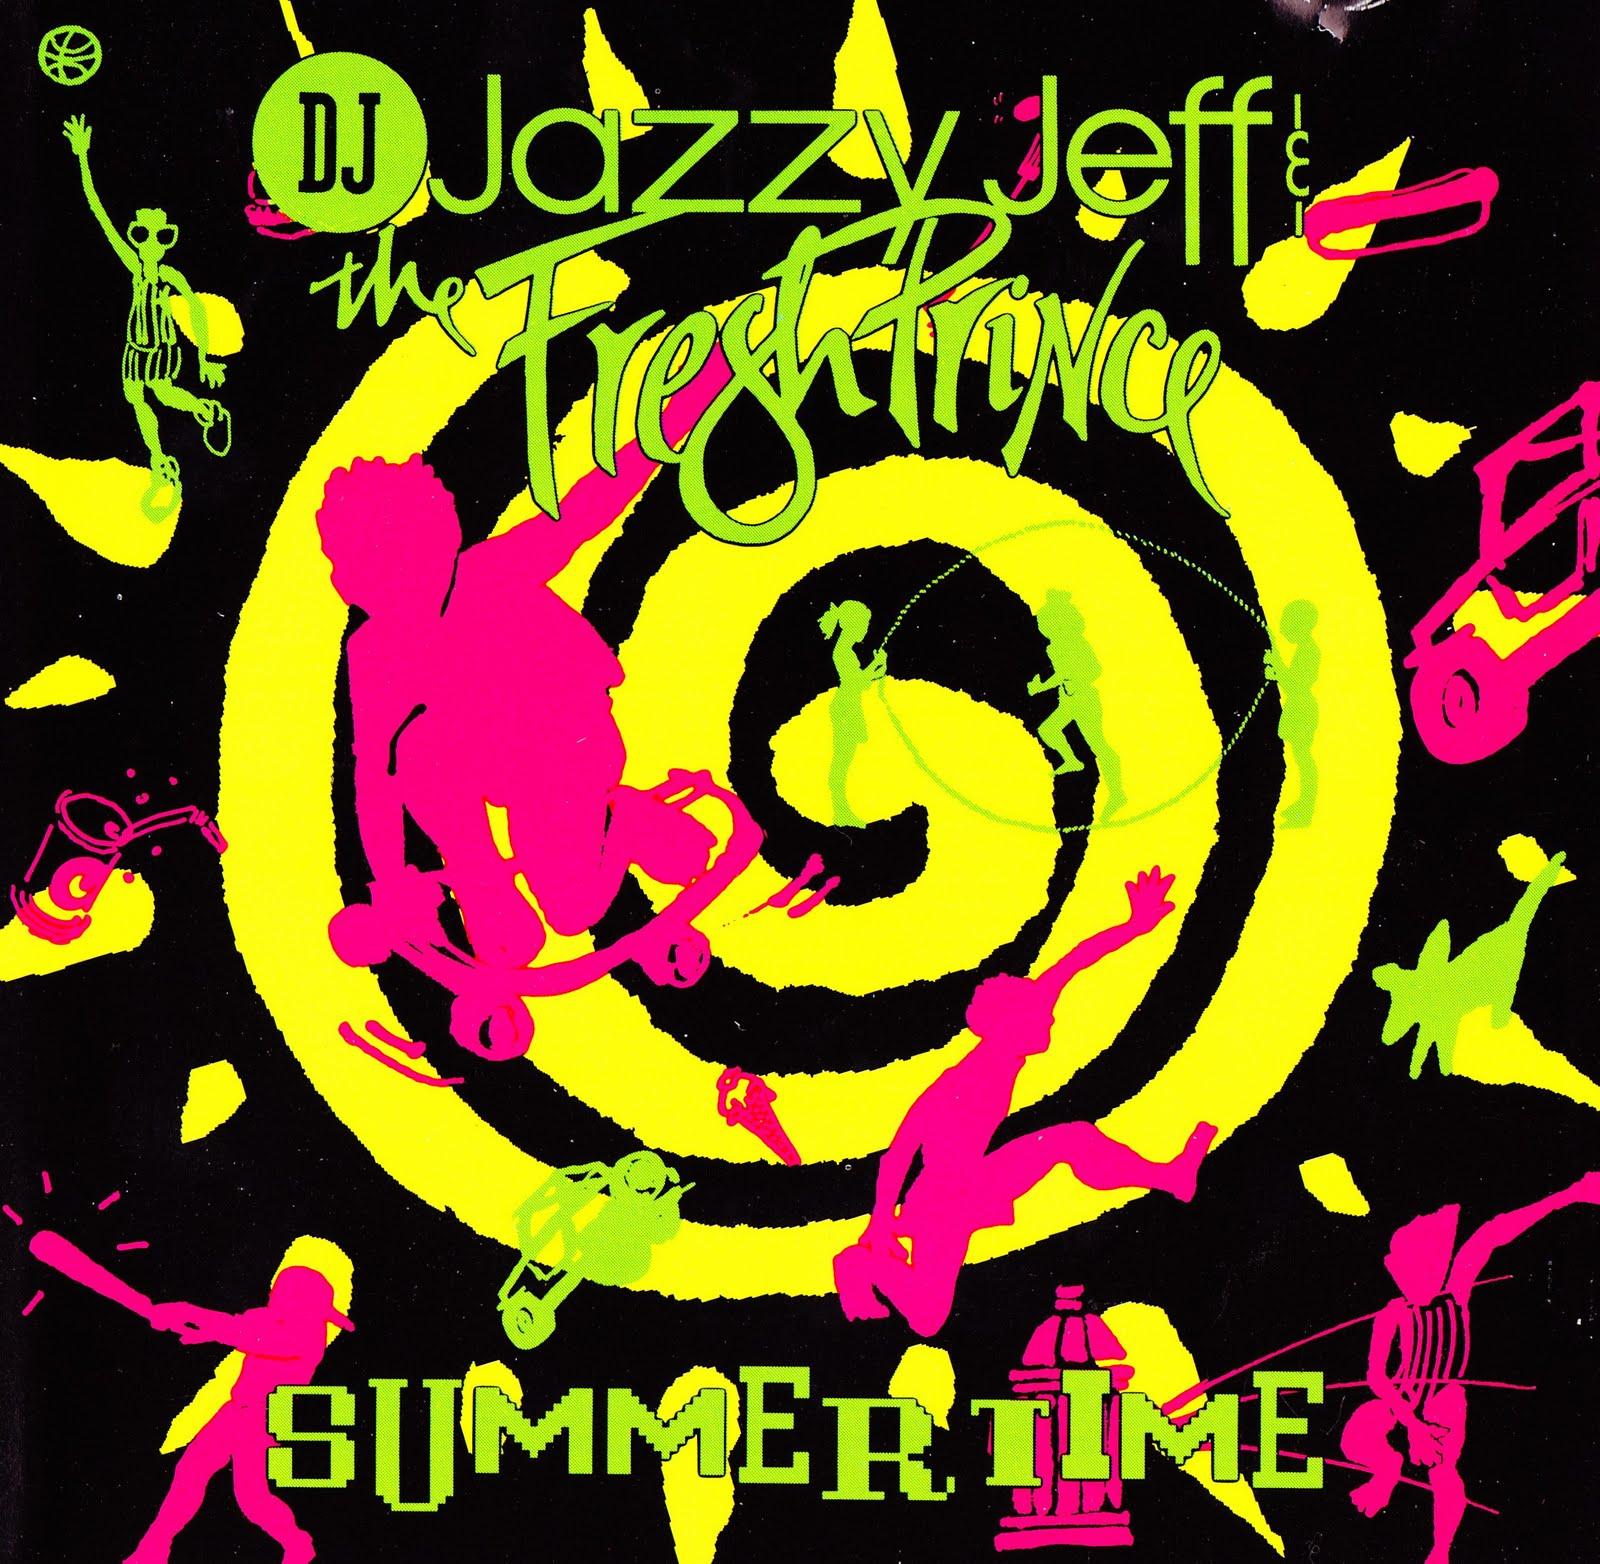 http://2.bp.blogspot.com/-WiKGOfaL8D4/Tks1NBjNcAI/AAAAAAAACQE/iarwxnAS0Ac/s1600/DJ+Jazzy+Jeff+Summertime+8+trk+FRONT.jpg